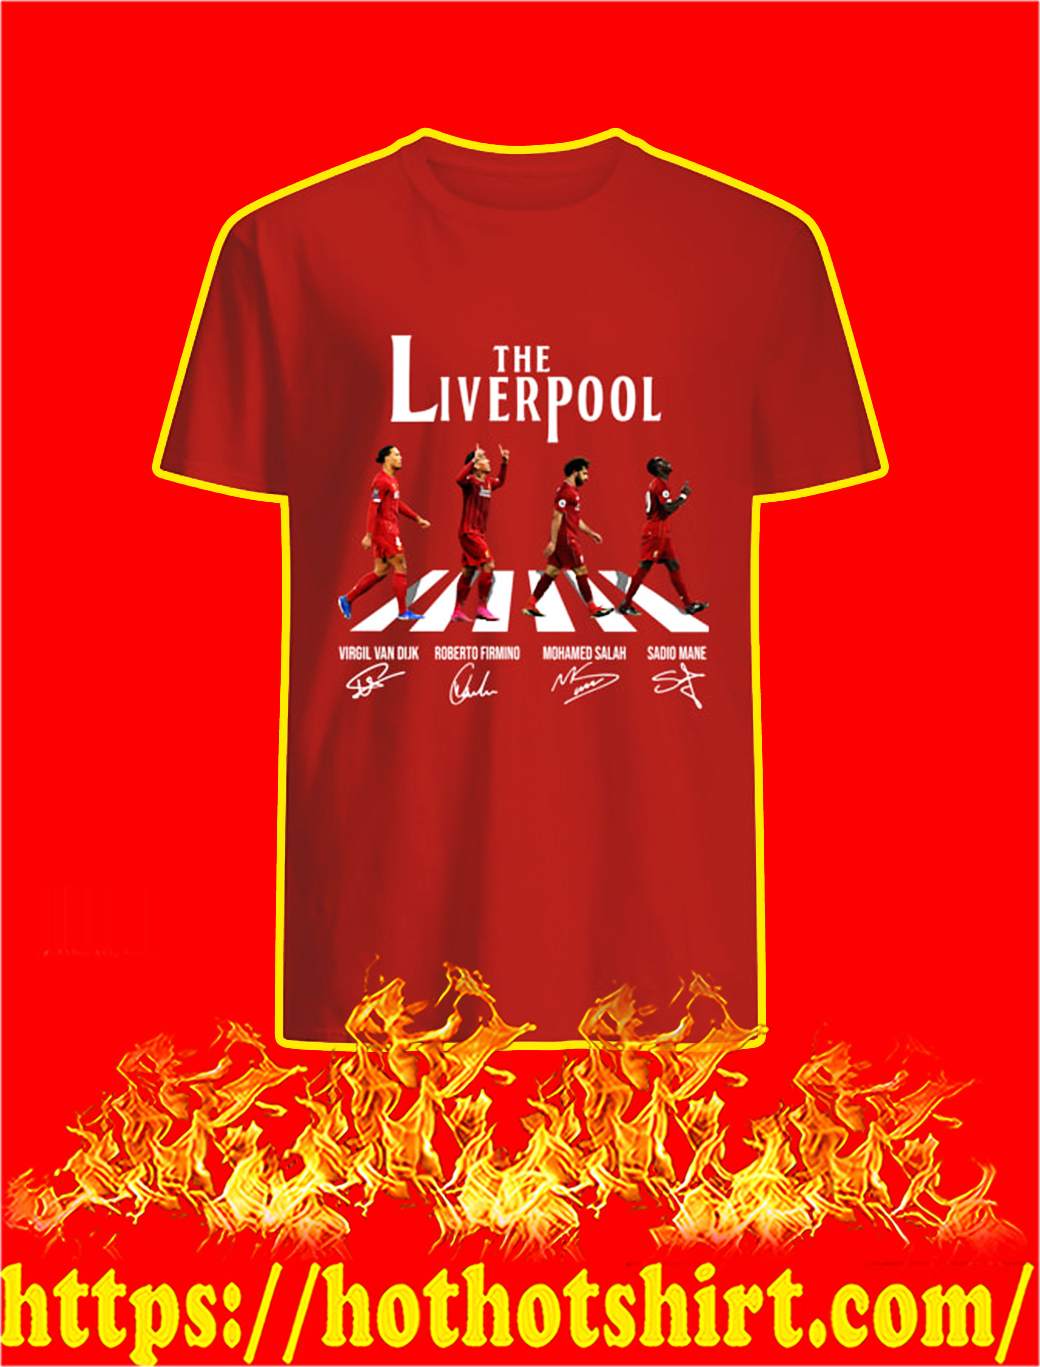 The Liverpool Abbey Road Virgin Firmino Salah Mane Signature shirt